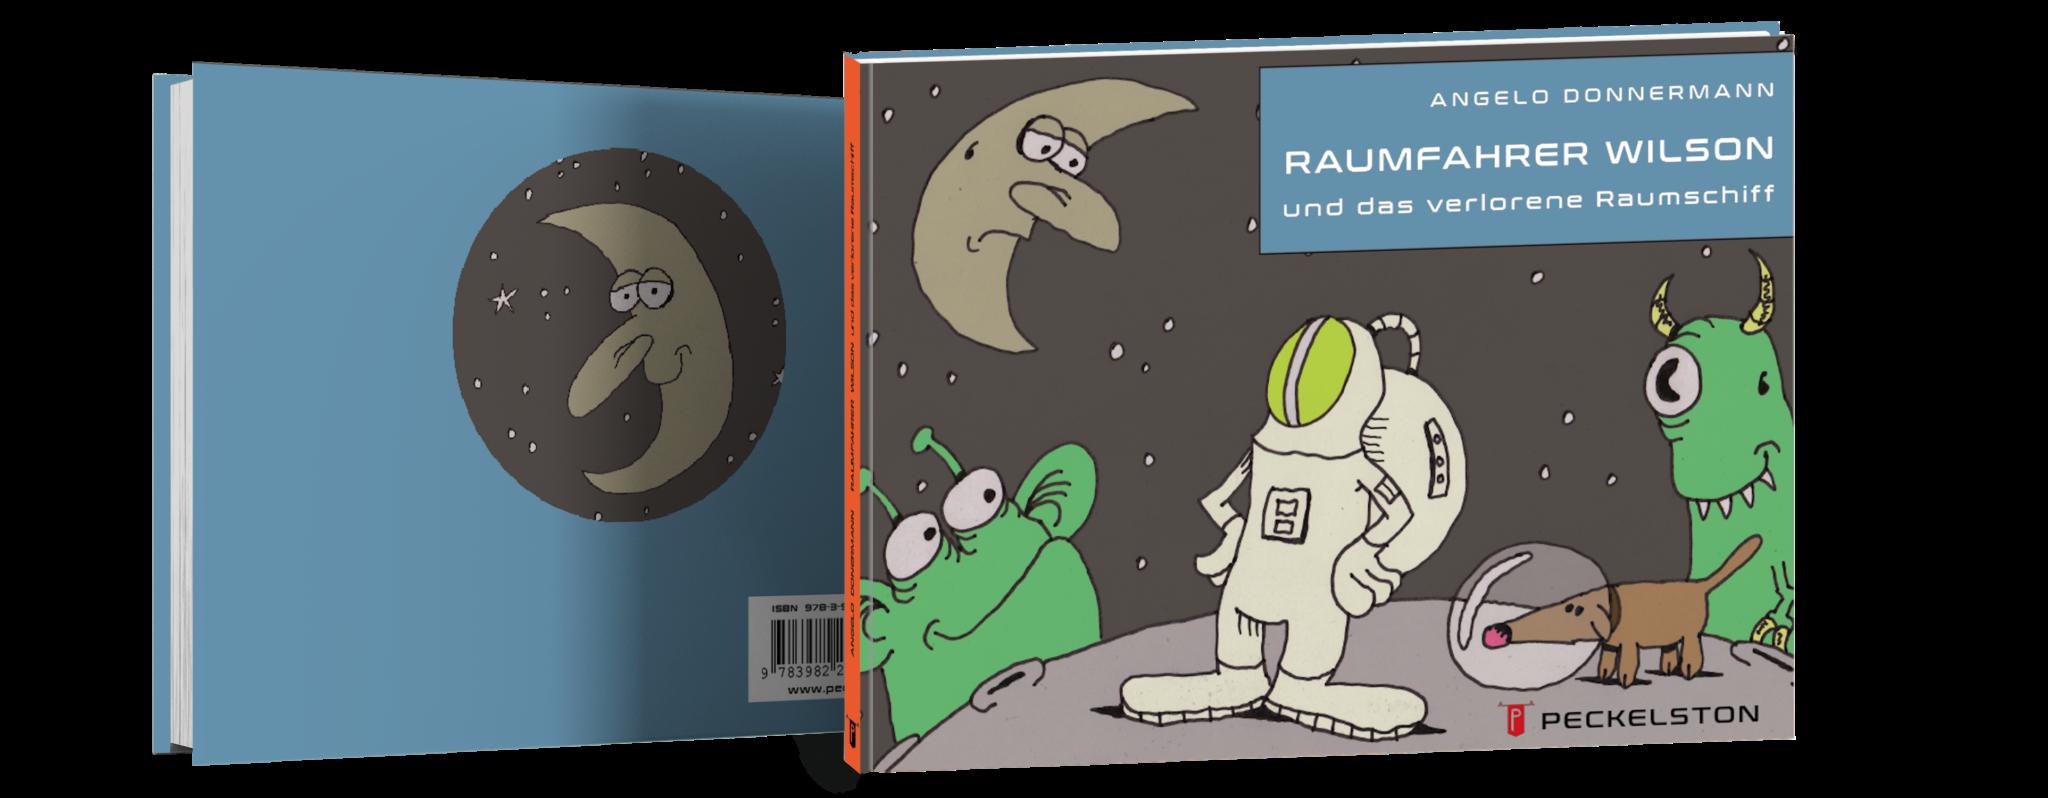 Peckelston Kinderbuchverlag Raumfahrer Wilson Angelo Donnermann